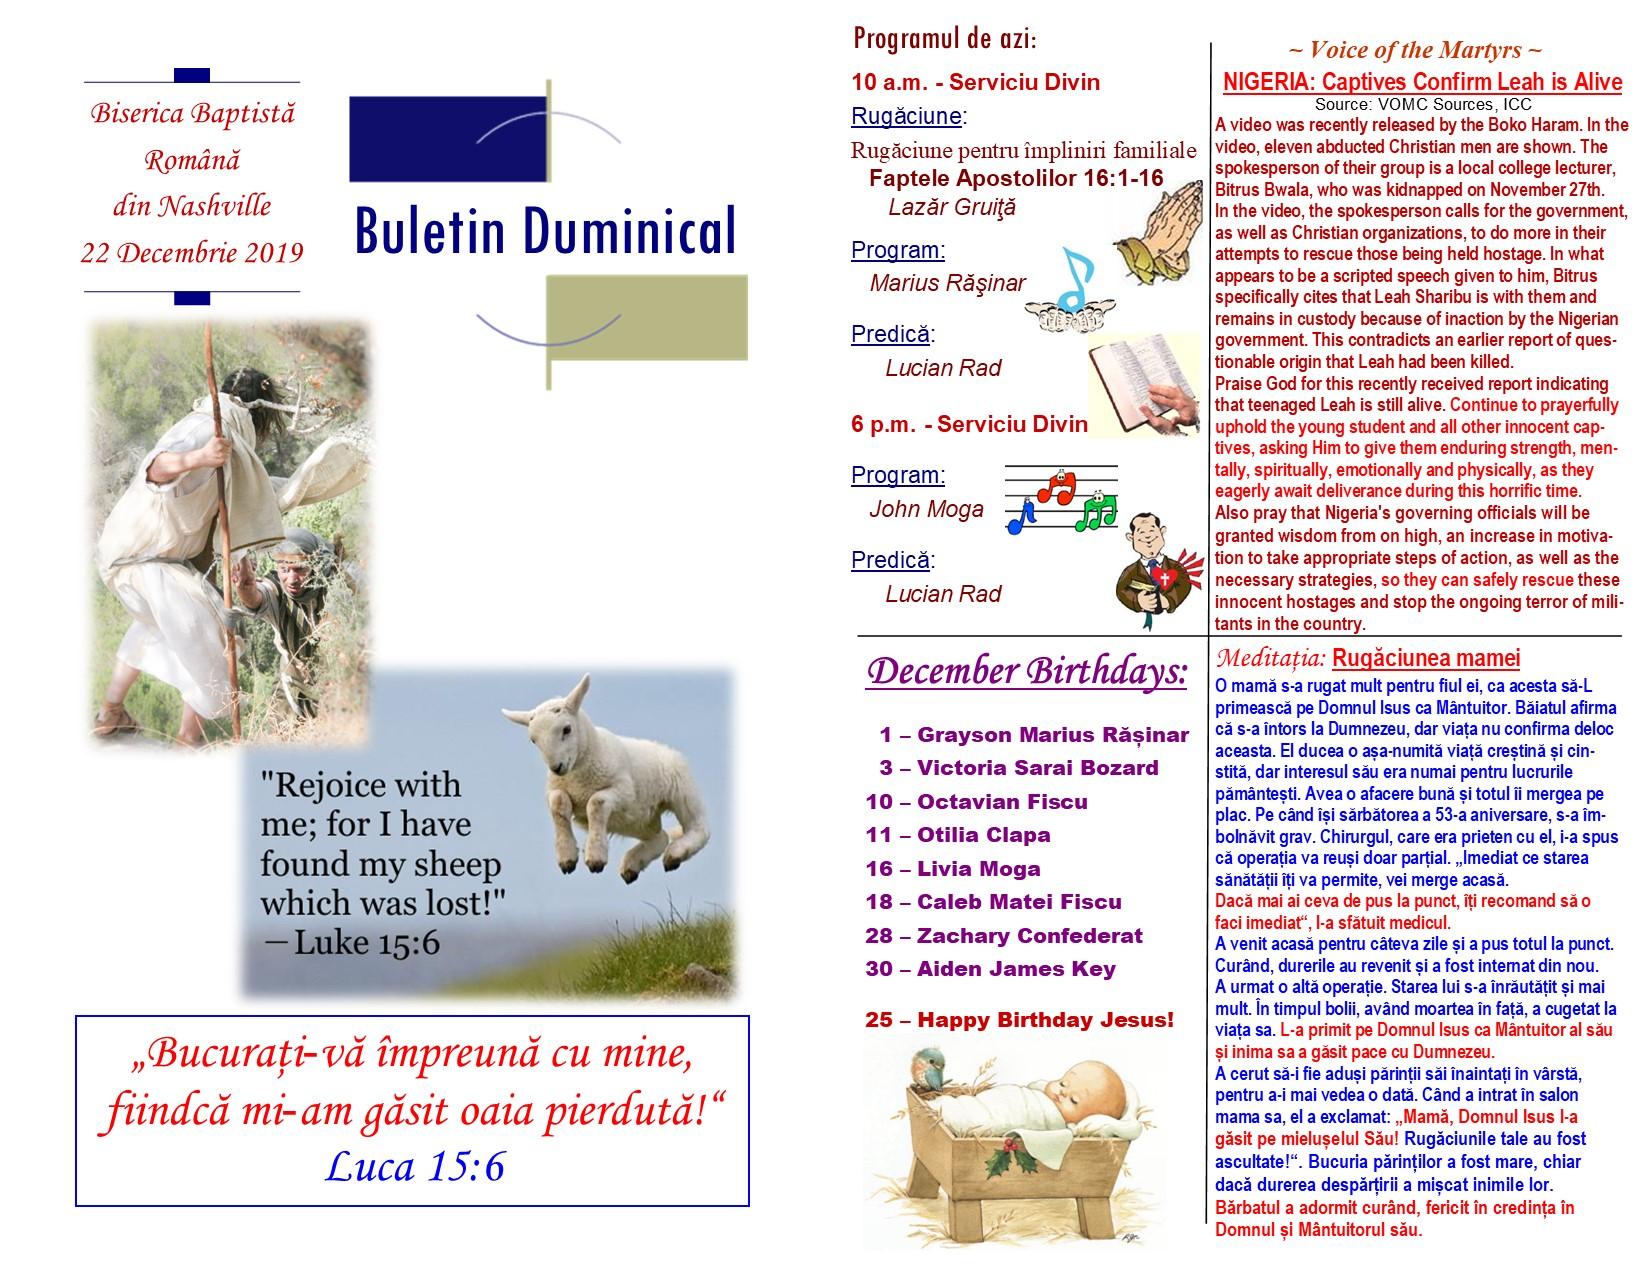 Buletin 12-22-19 page 1 & 2